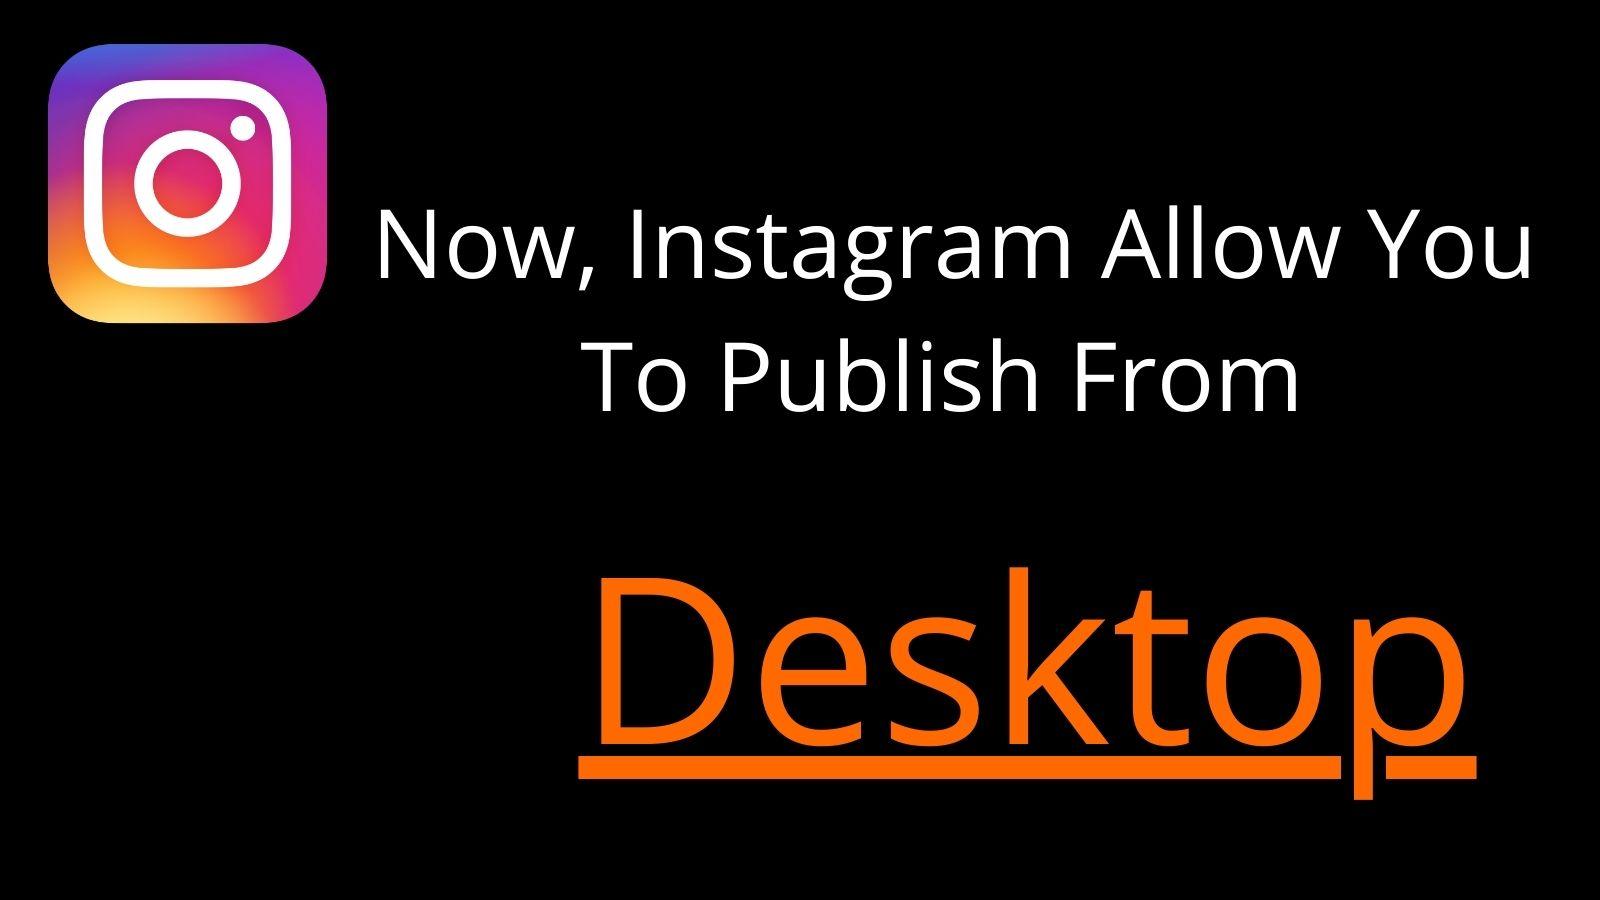 Upload On Instagram From Desktop